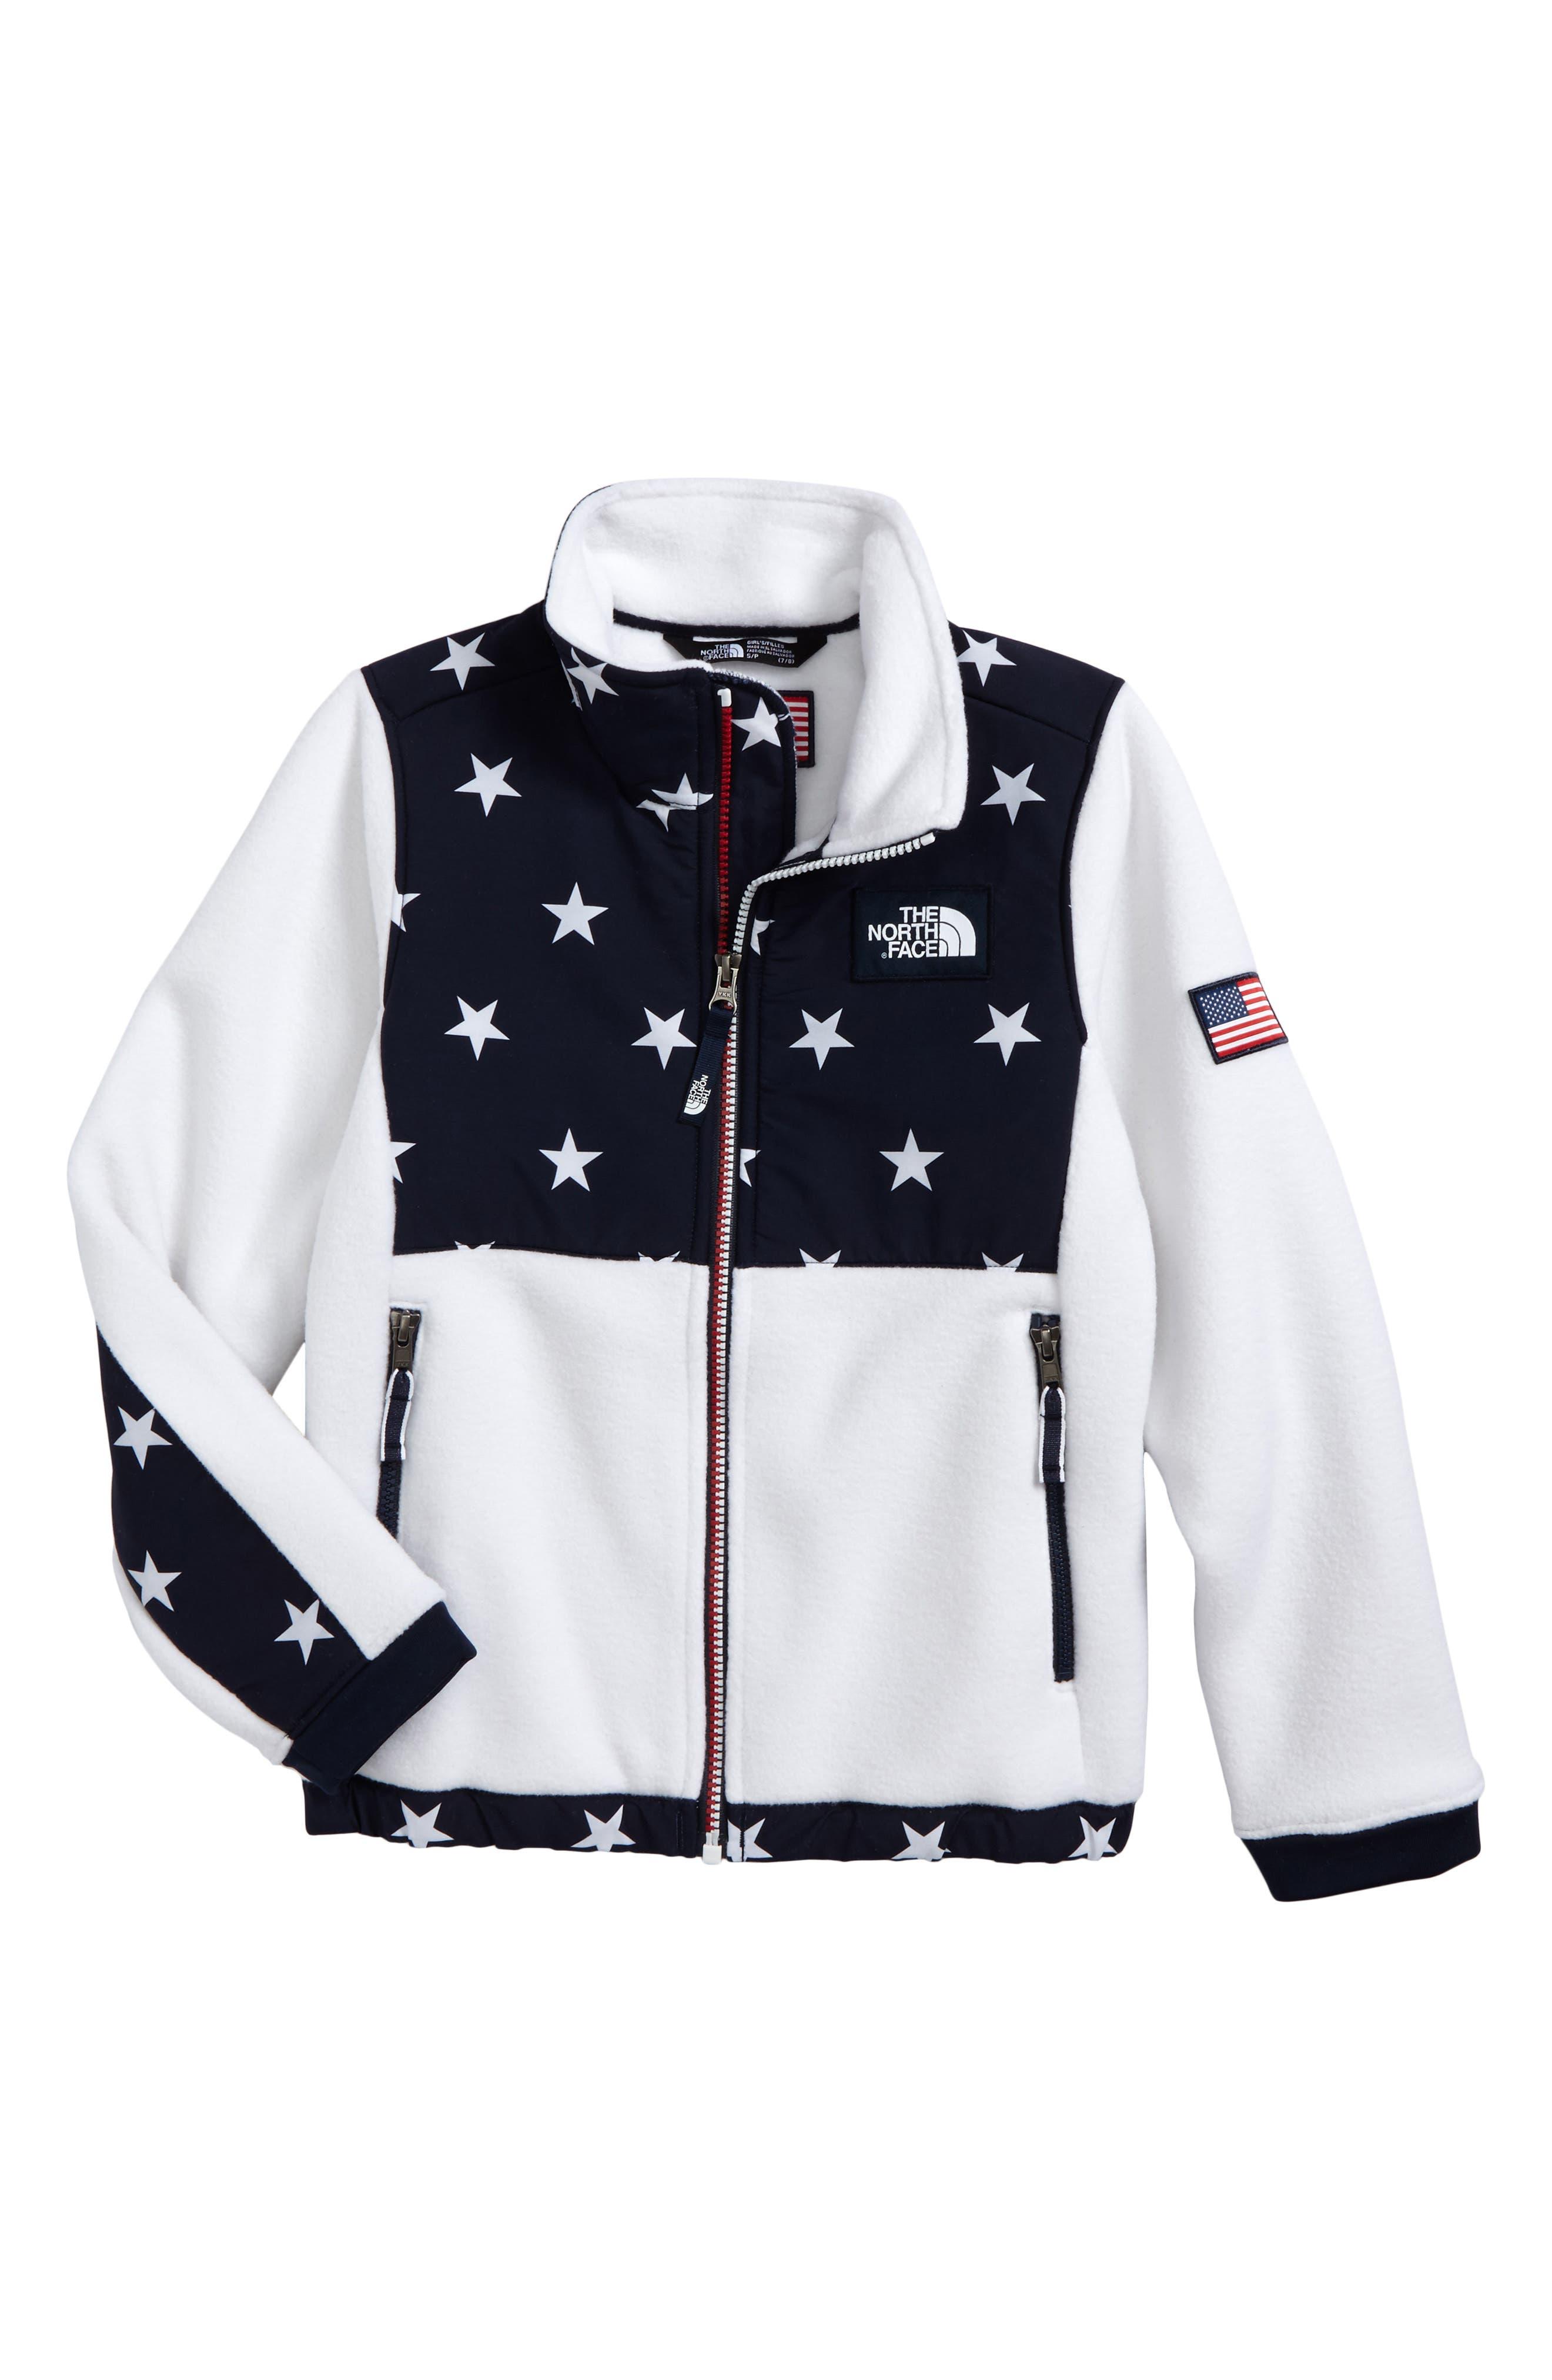 Denali Recycled Fleece Jacket,                             Main thumbnail 1, color,                             Tnf White